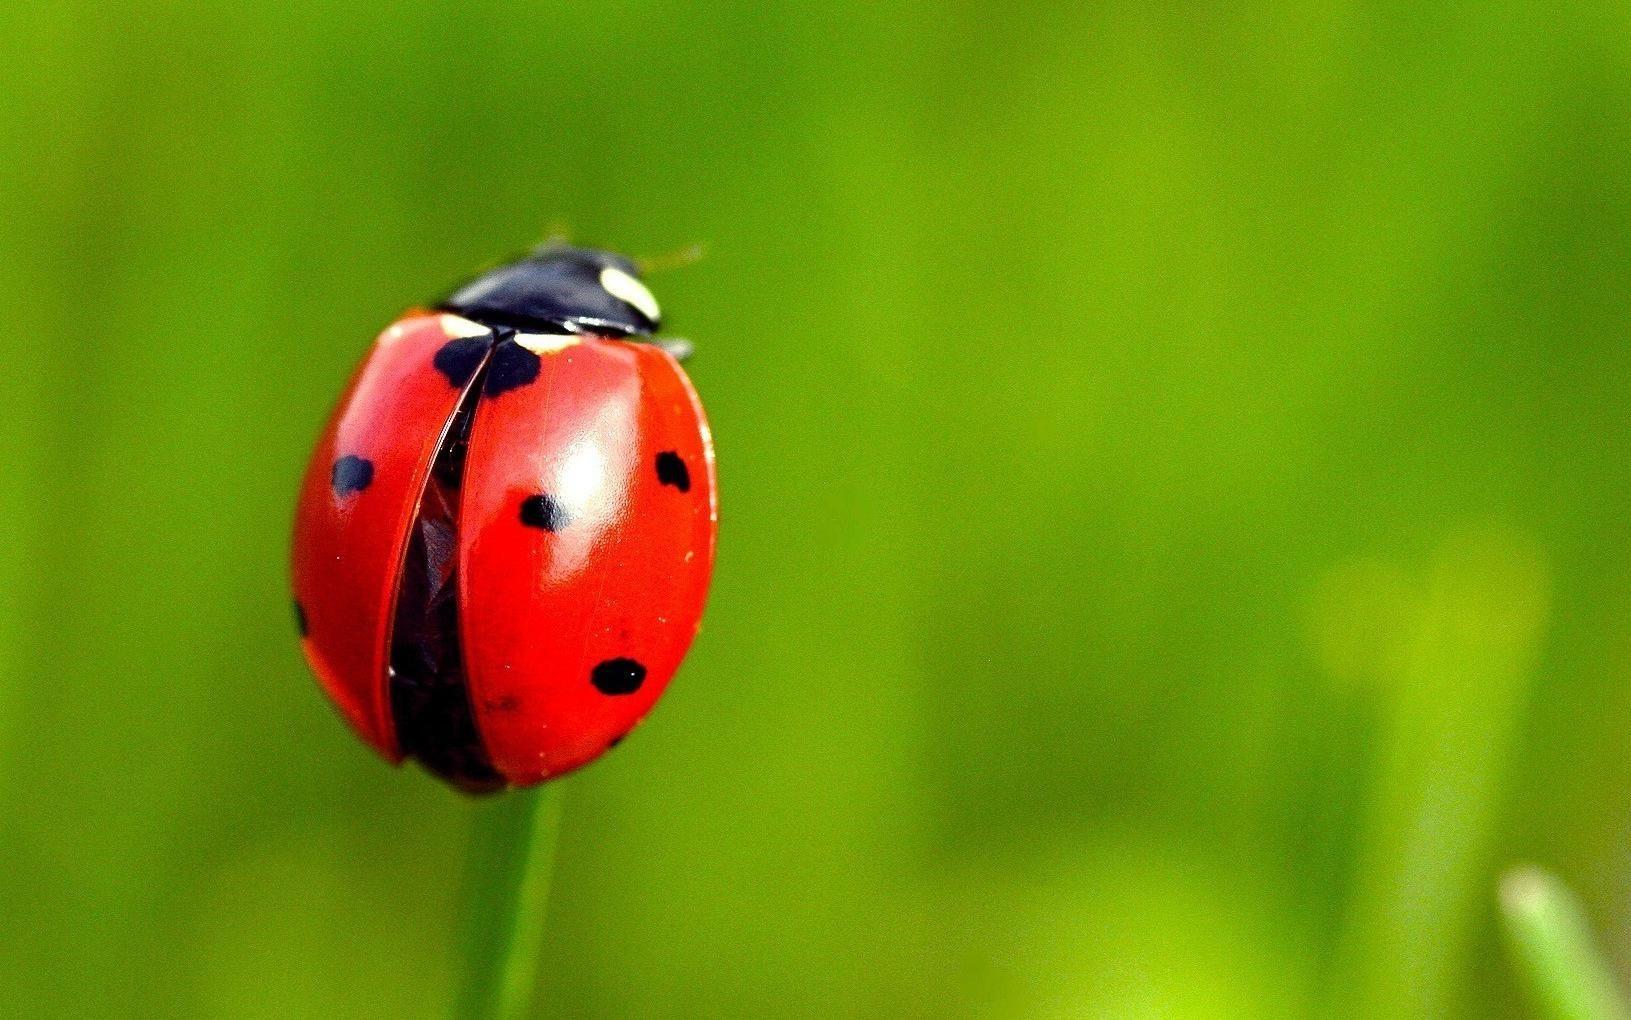 ladybug dream meaning, dream about ladybug. ladybug dream interpretation, seeing in a dream ladybug